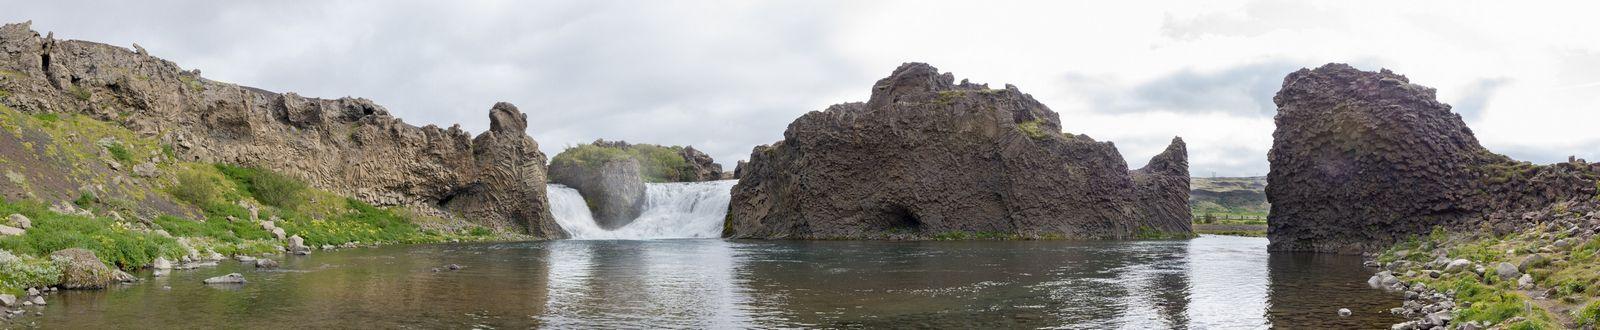 Las aguas de Hjálparfoss